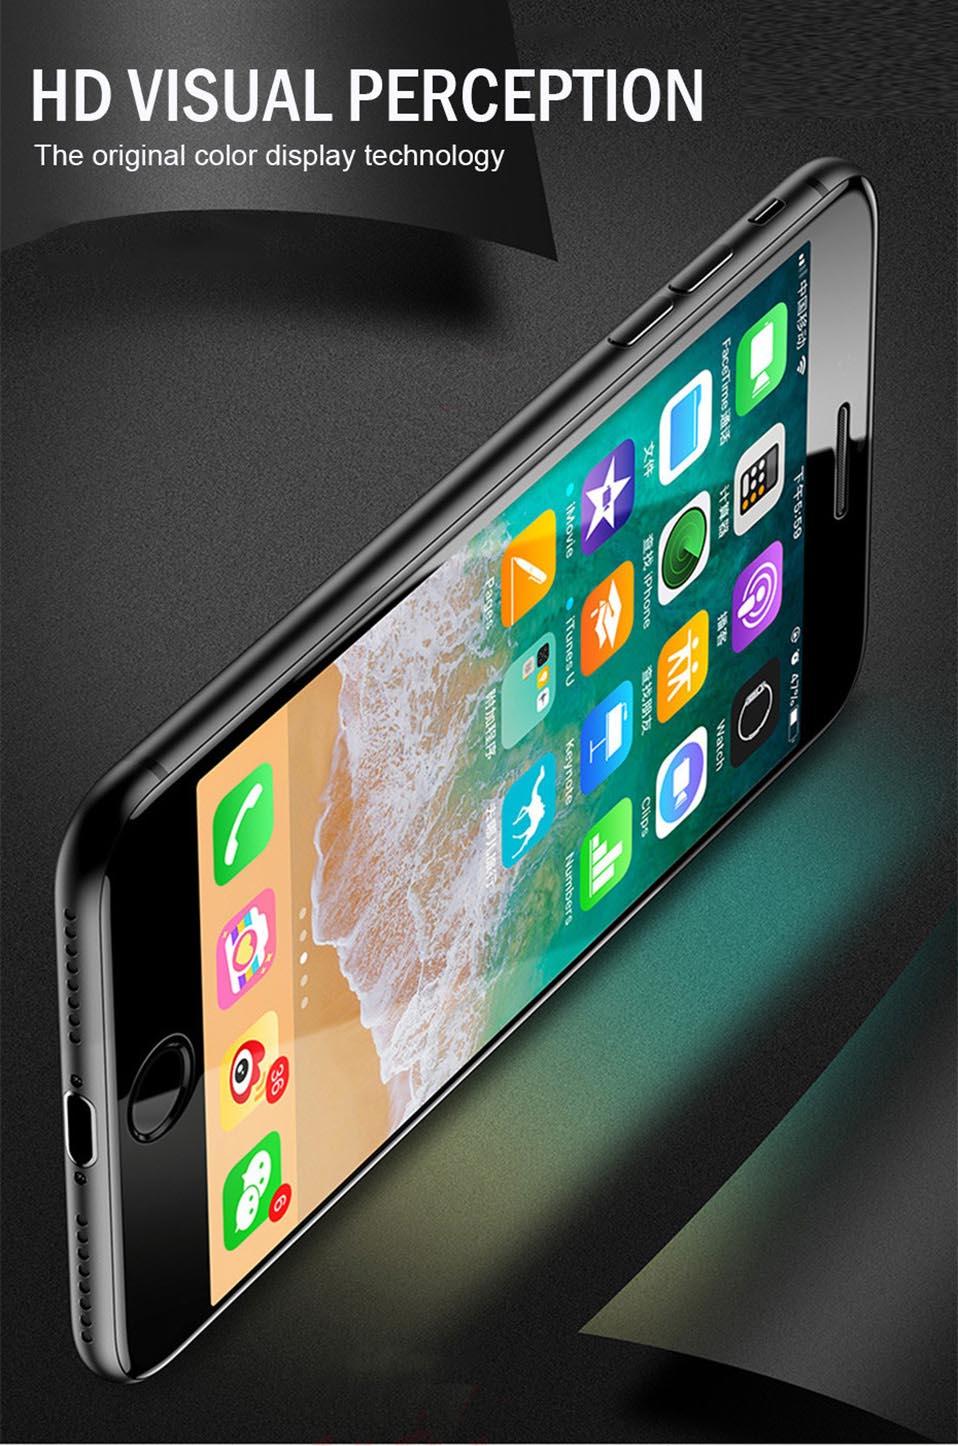 5D Glasses for iPhone 6 6s plus Glass Film Full Cover iphone6 Screen Protector for iPhone 6 6s 7 8 plus x Tempered Glass 3D 4D (3)